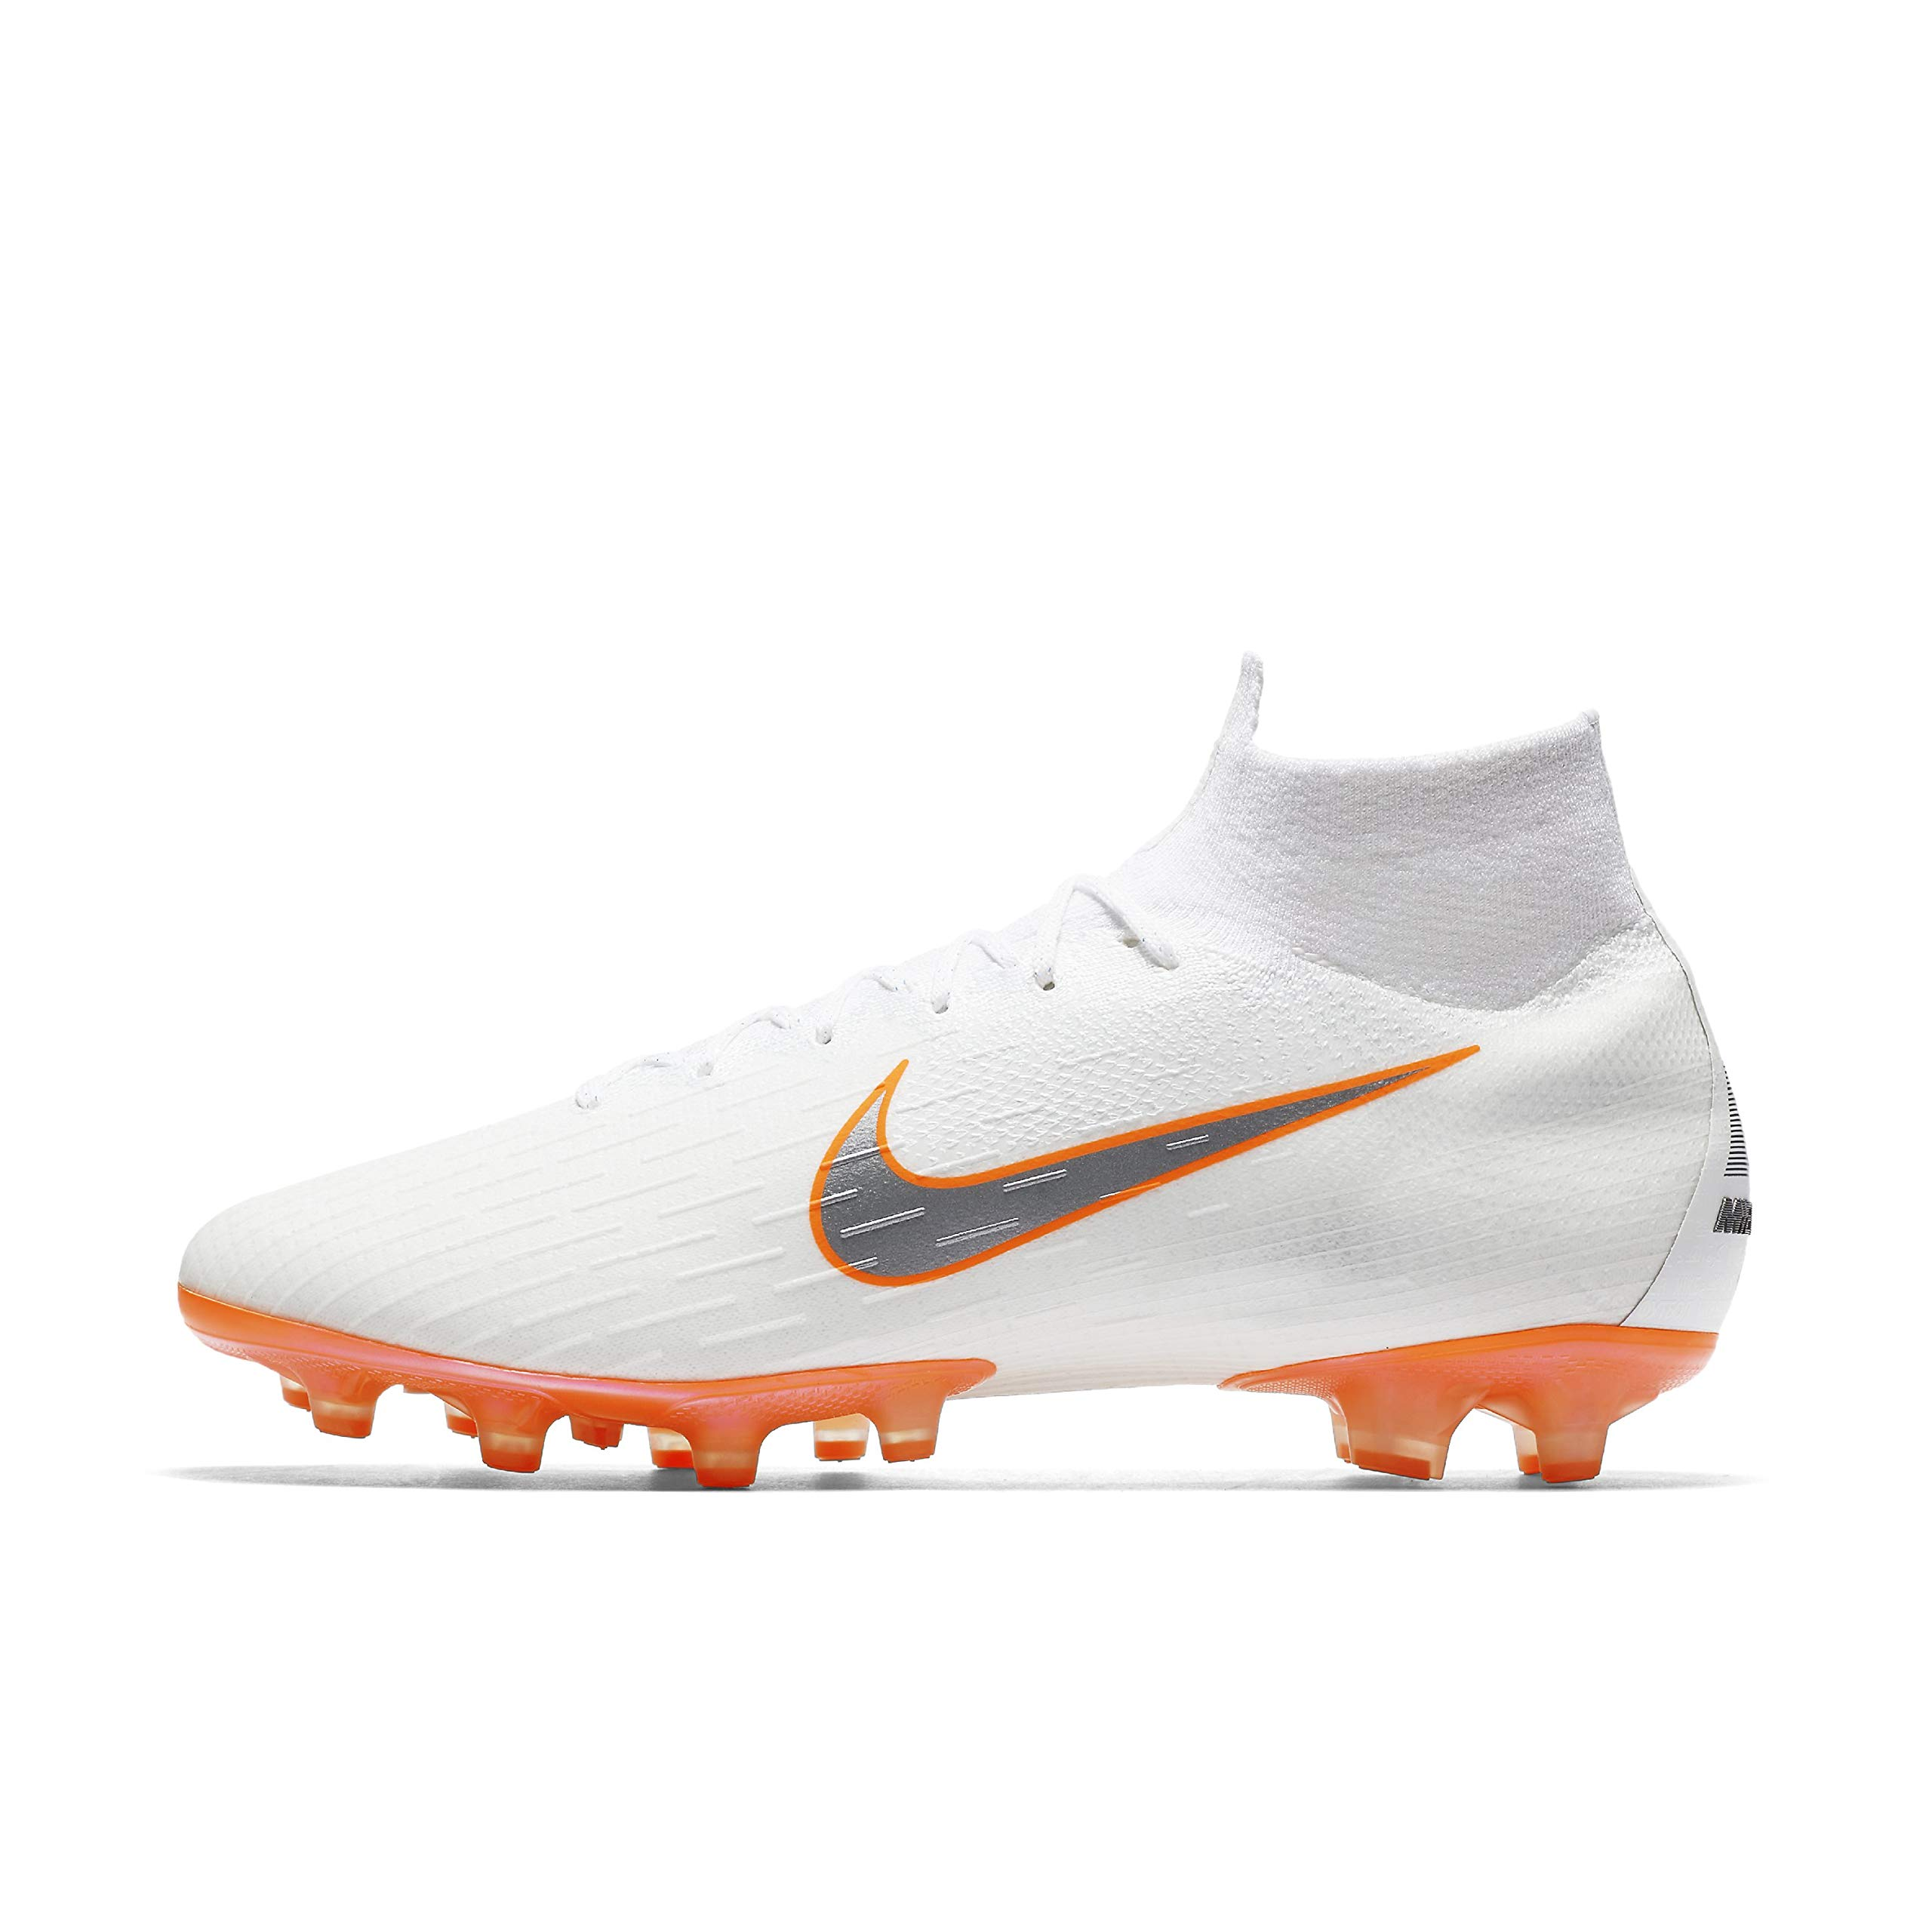 Nike Superfly 6 Elite AG Firm GroundCleats (11.5 D(M) US) White/Orange